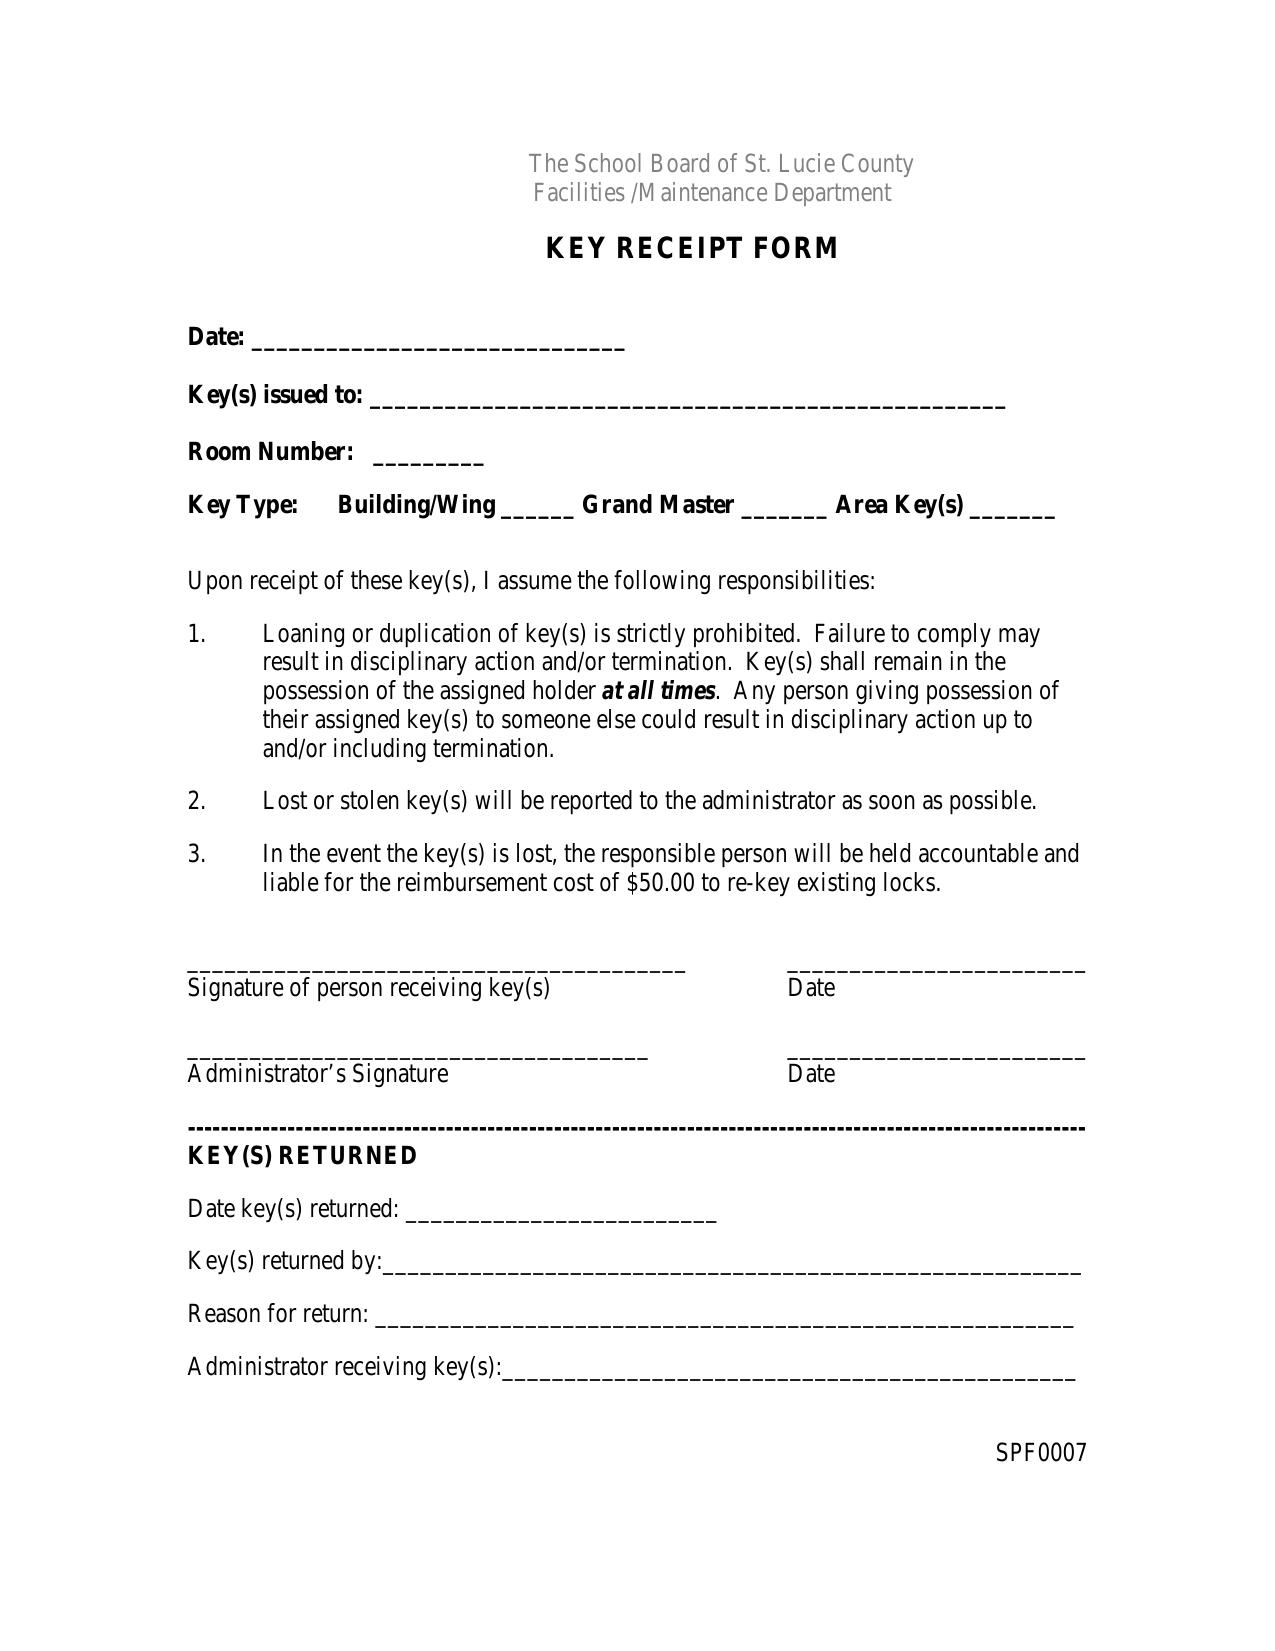 Key Receipt Form